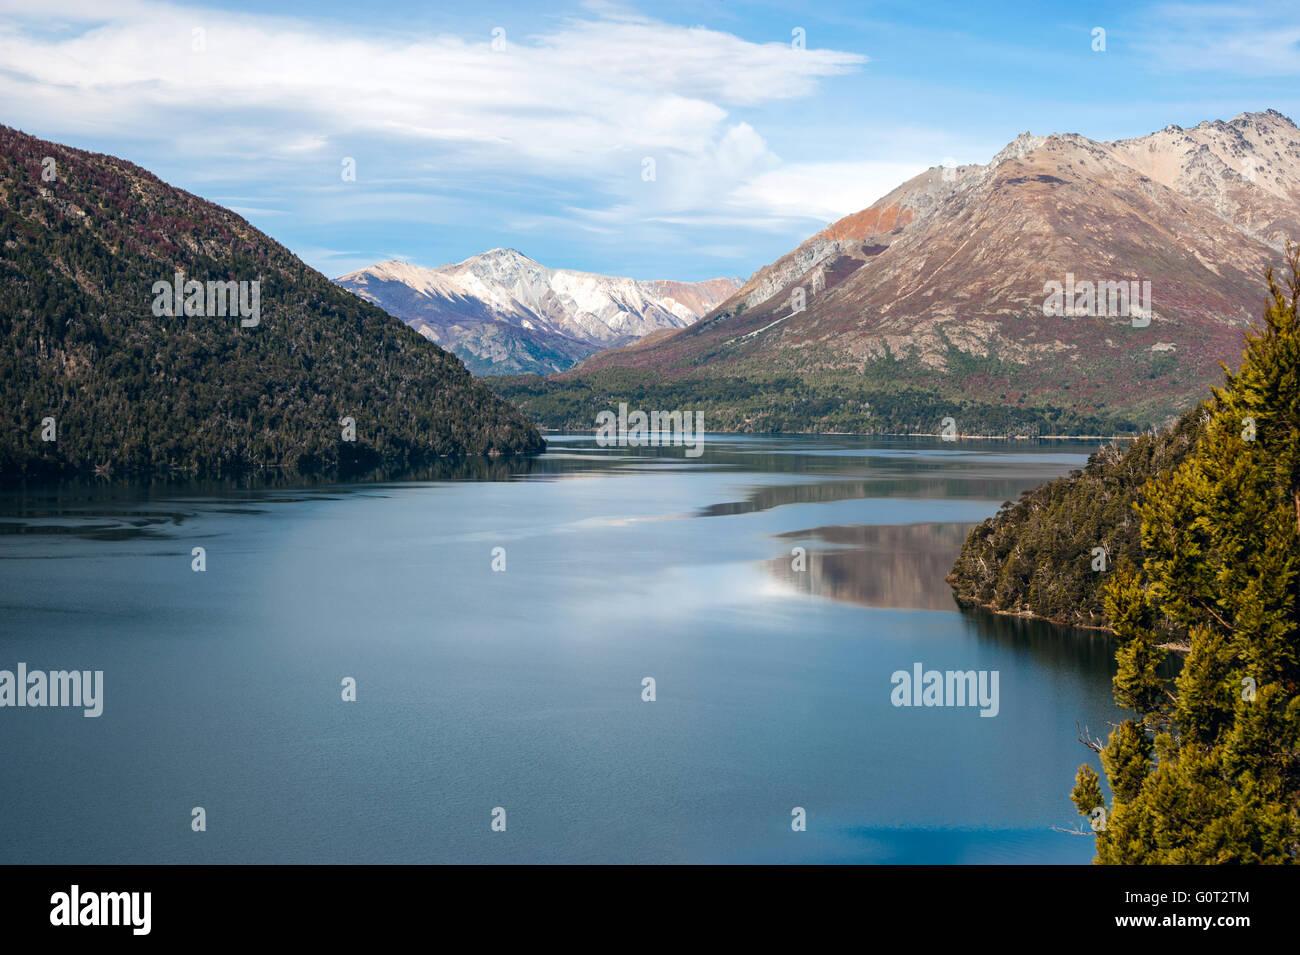 Otoño en Bariloche, Patagonia, Argentina Imagen De Stock